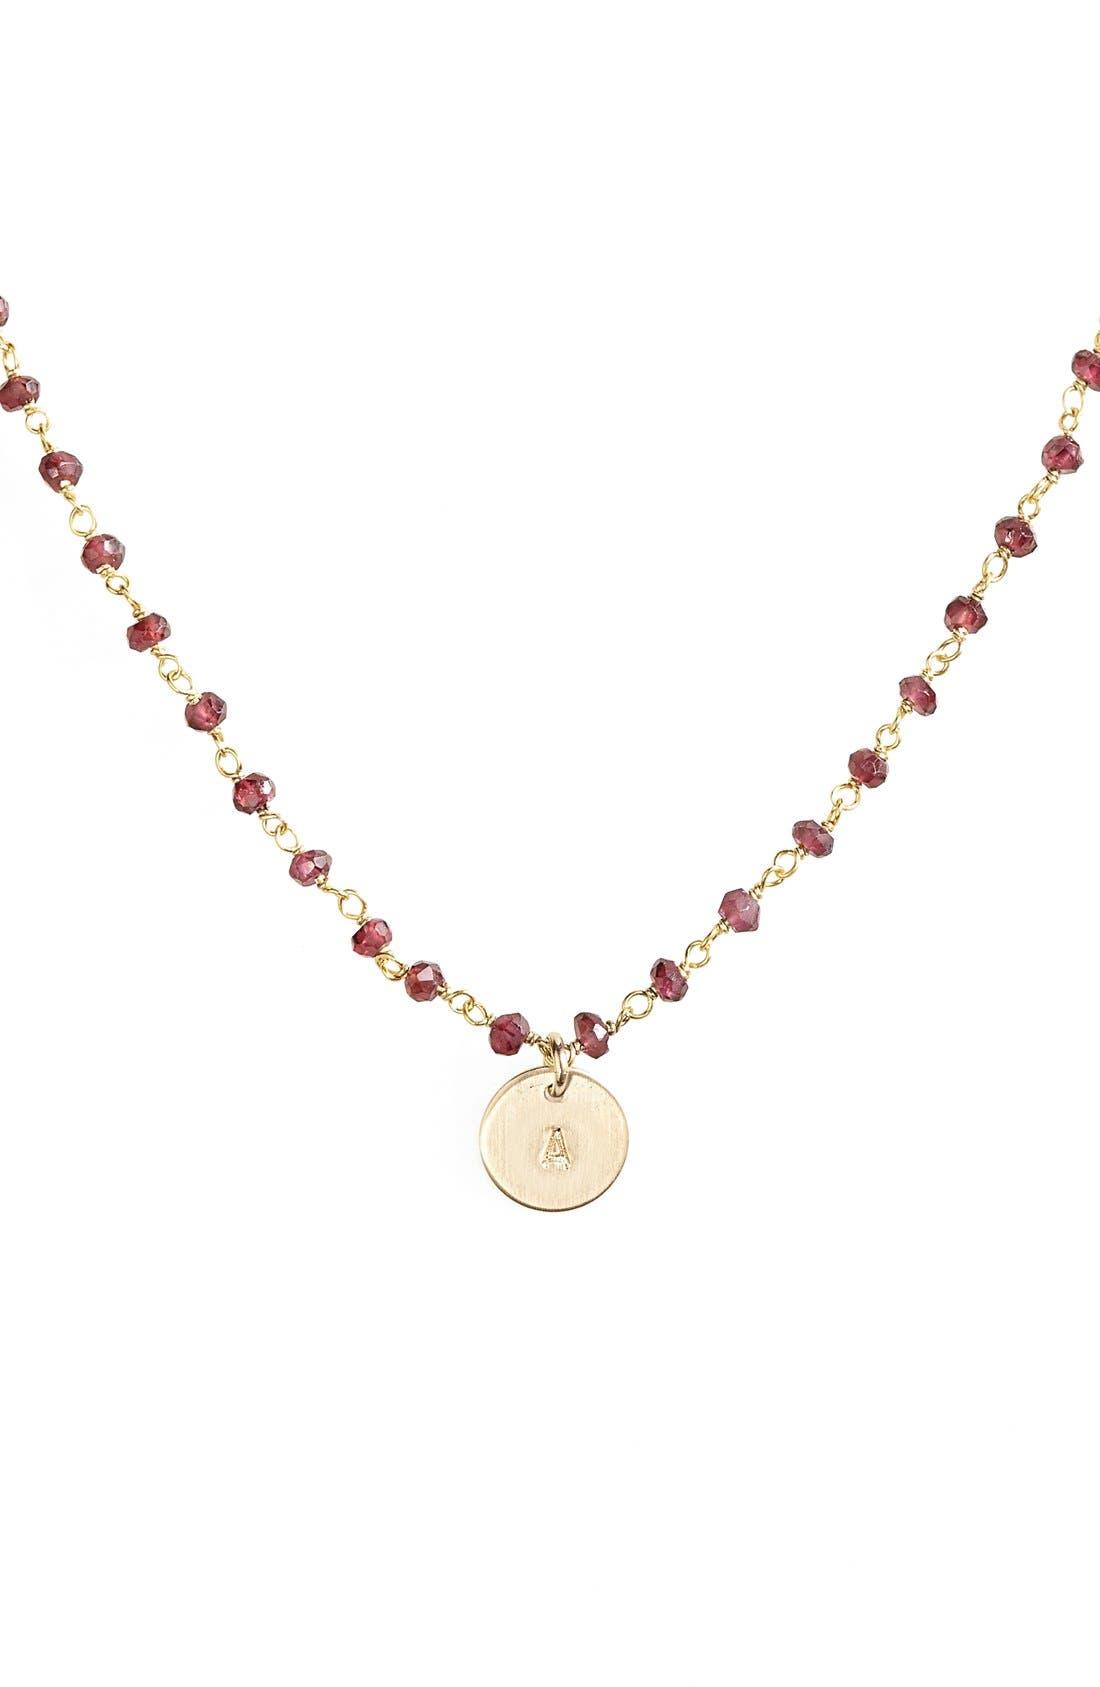 14k-Gold Fill Mini Initial Disc Garnet Chain Necklace,                             Alternate thumbnail 2, color,                             710